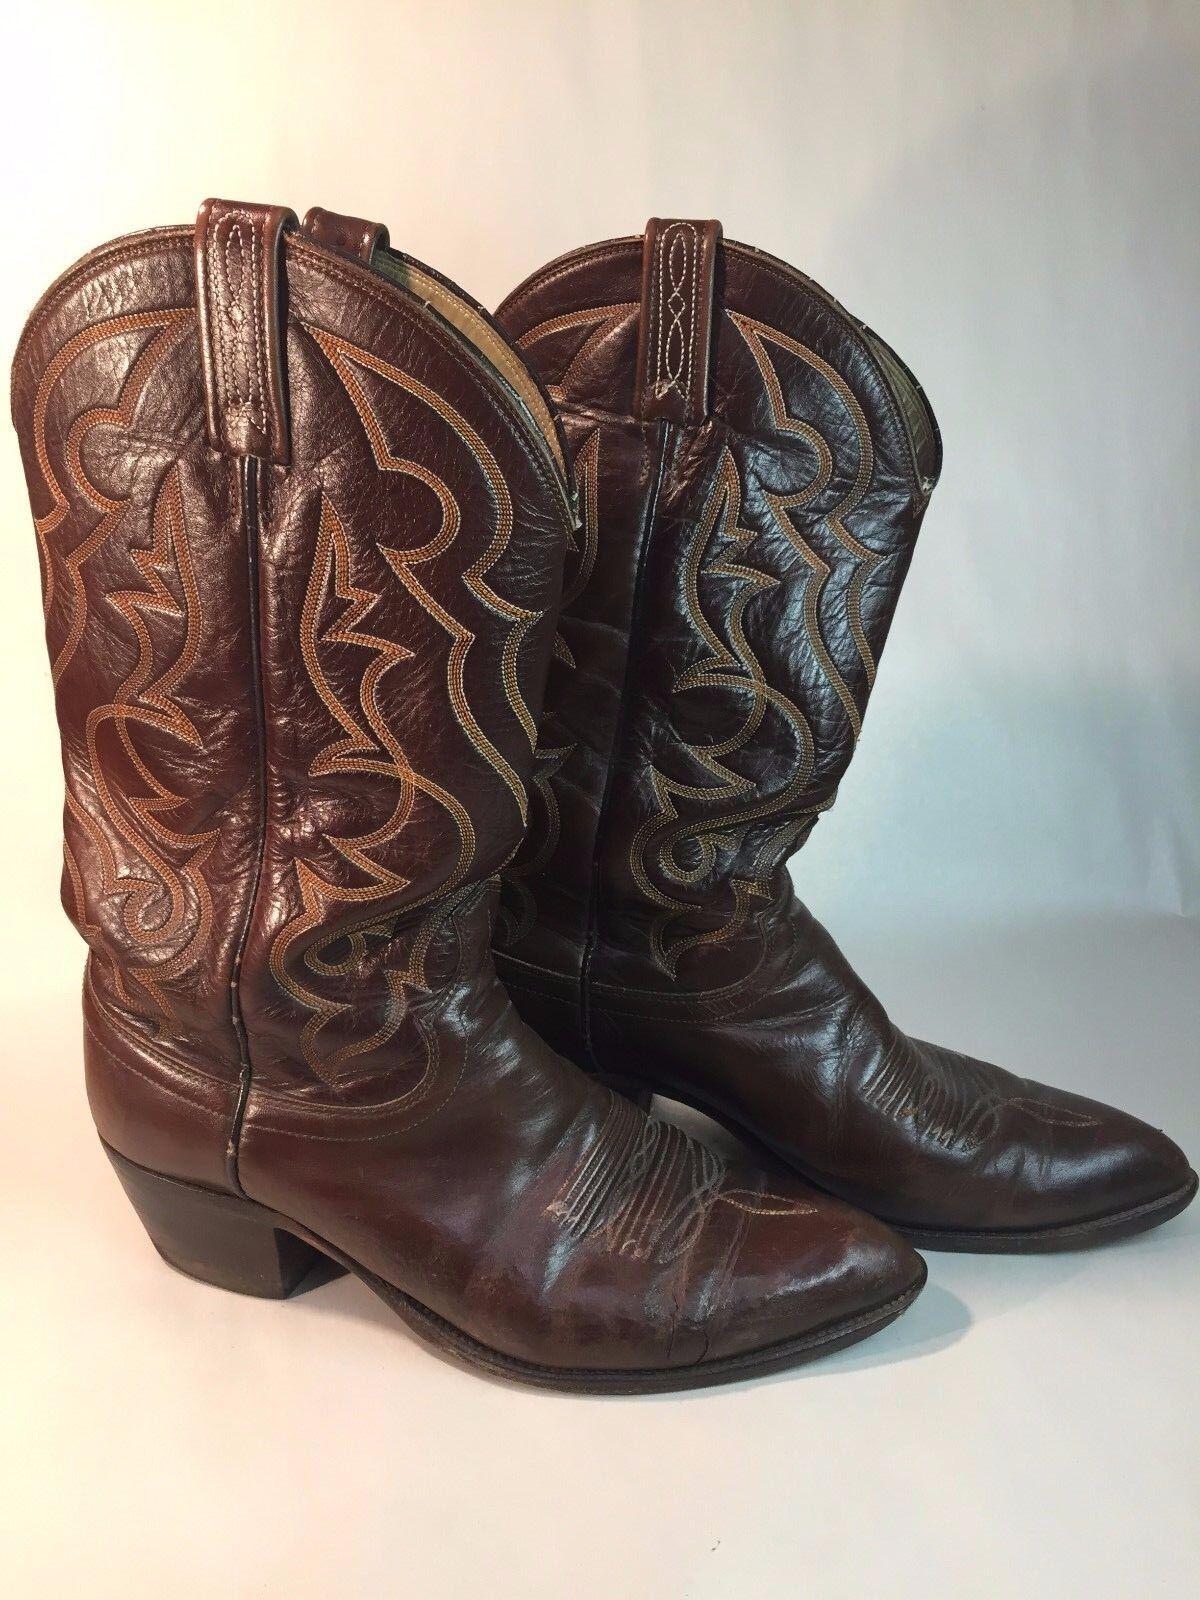 Pair of Vintage Retro Dan Post Post Post Western braun Leather Cowboy Stiefel Größe 10 D 3d35e2